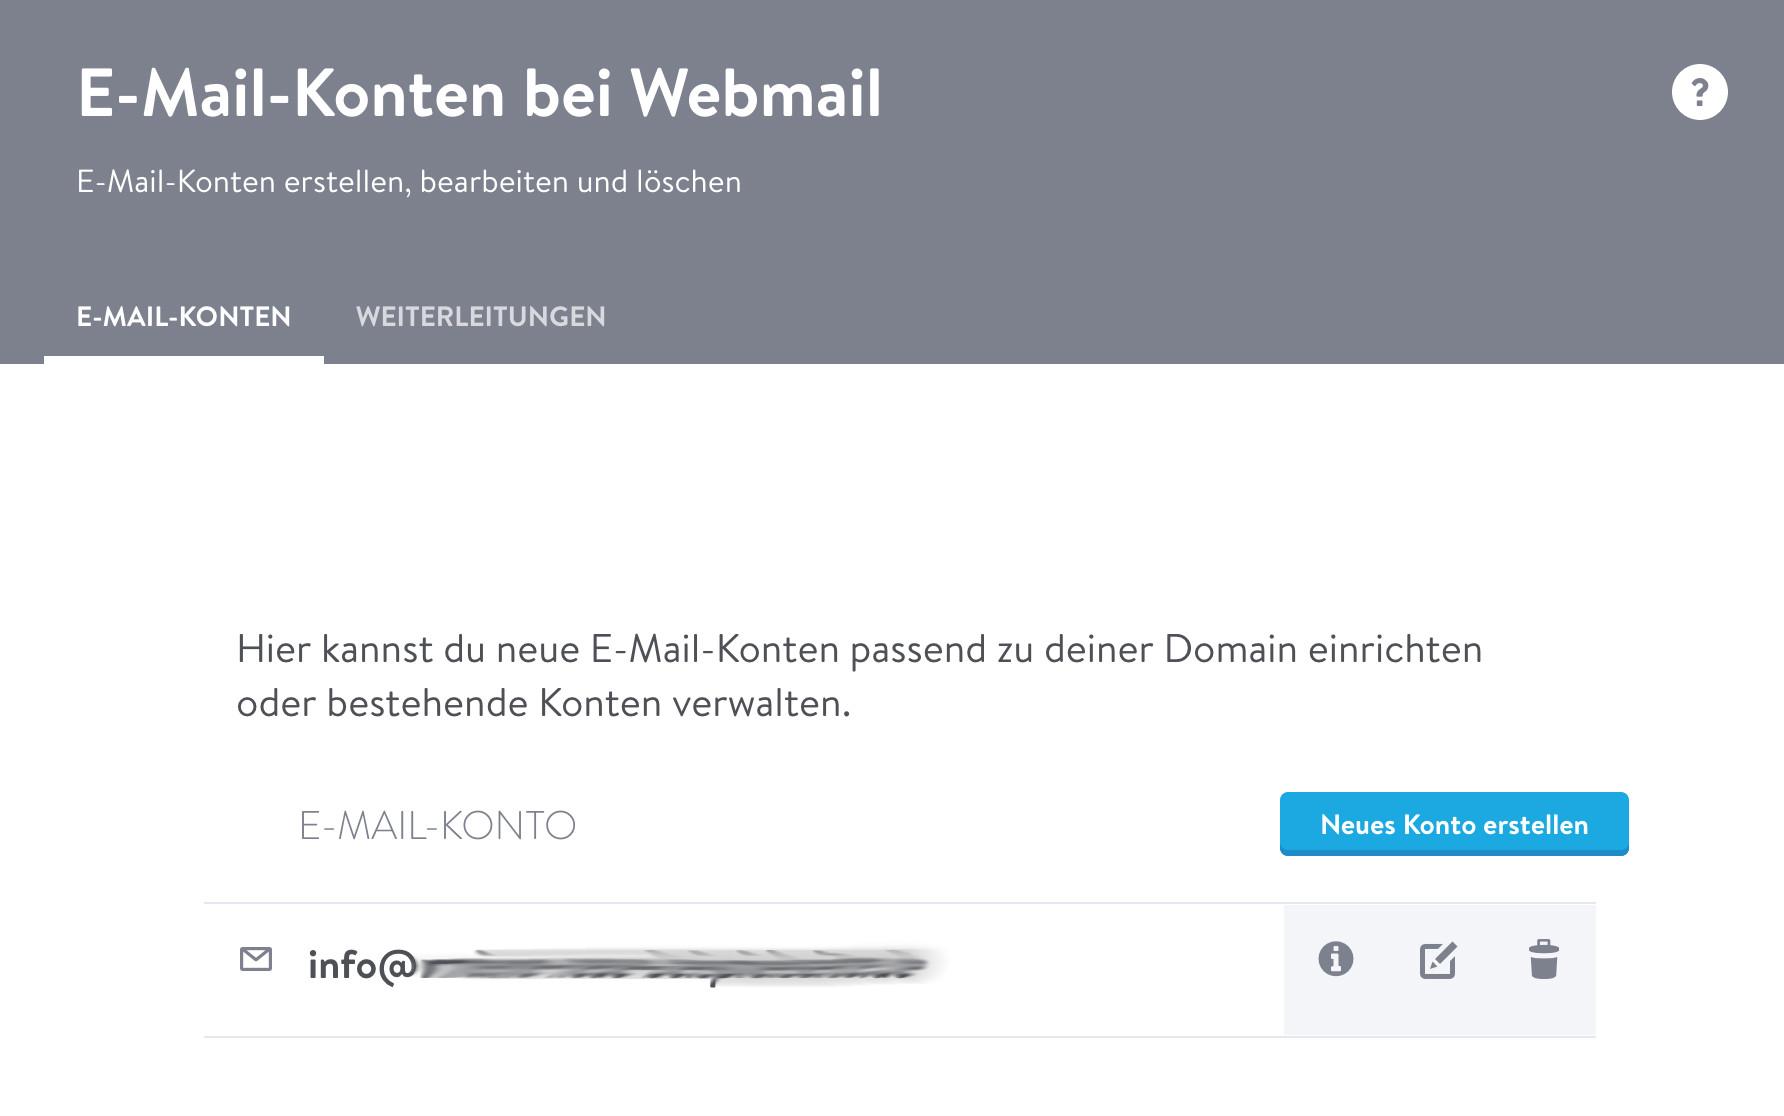 Webmail: Ansicht E-Mail-Konto hinzufügen